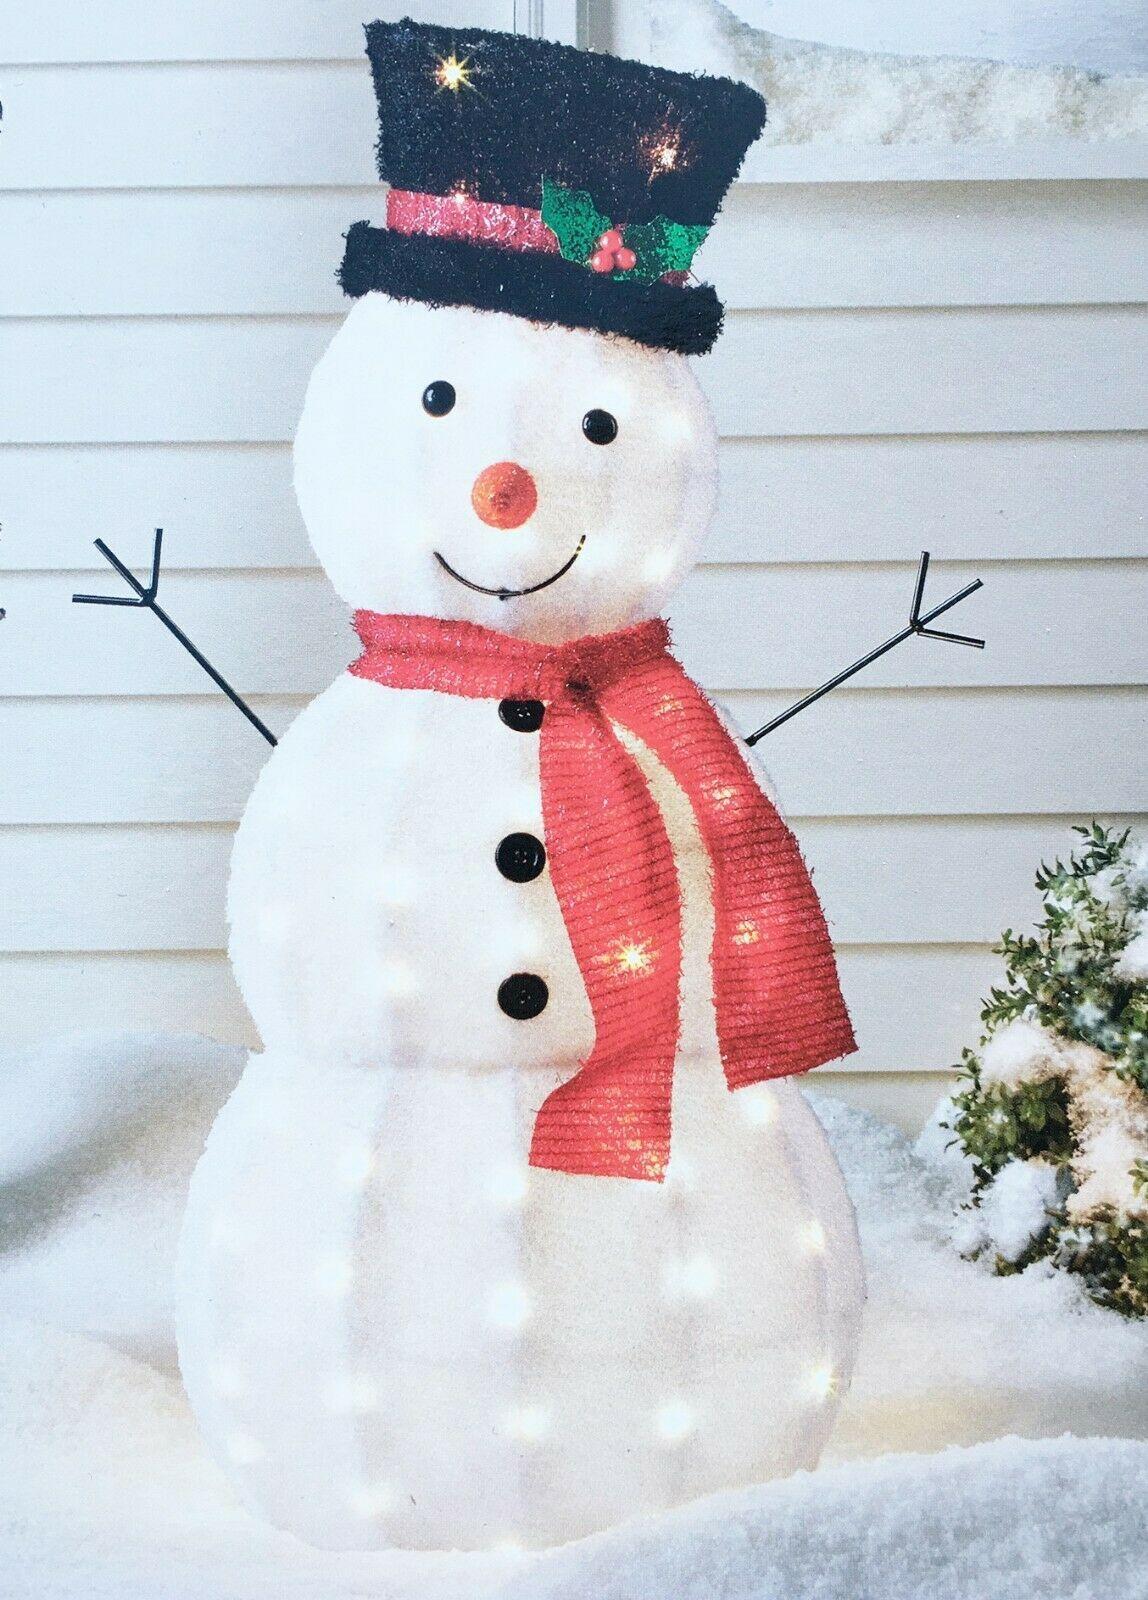 "Wondershop 37"" Lit Fabric Snowman Display with 50 Clear Mini Bulbs Yard Decor"